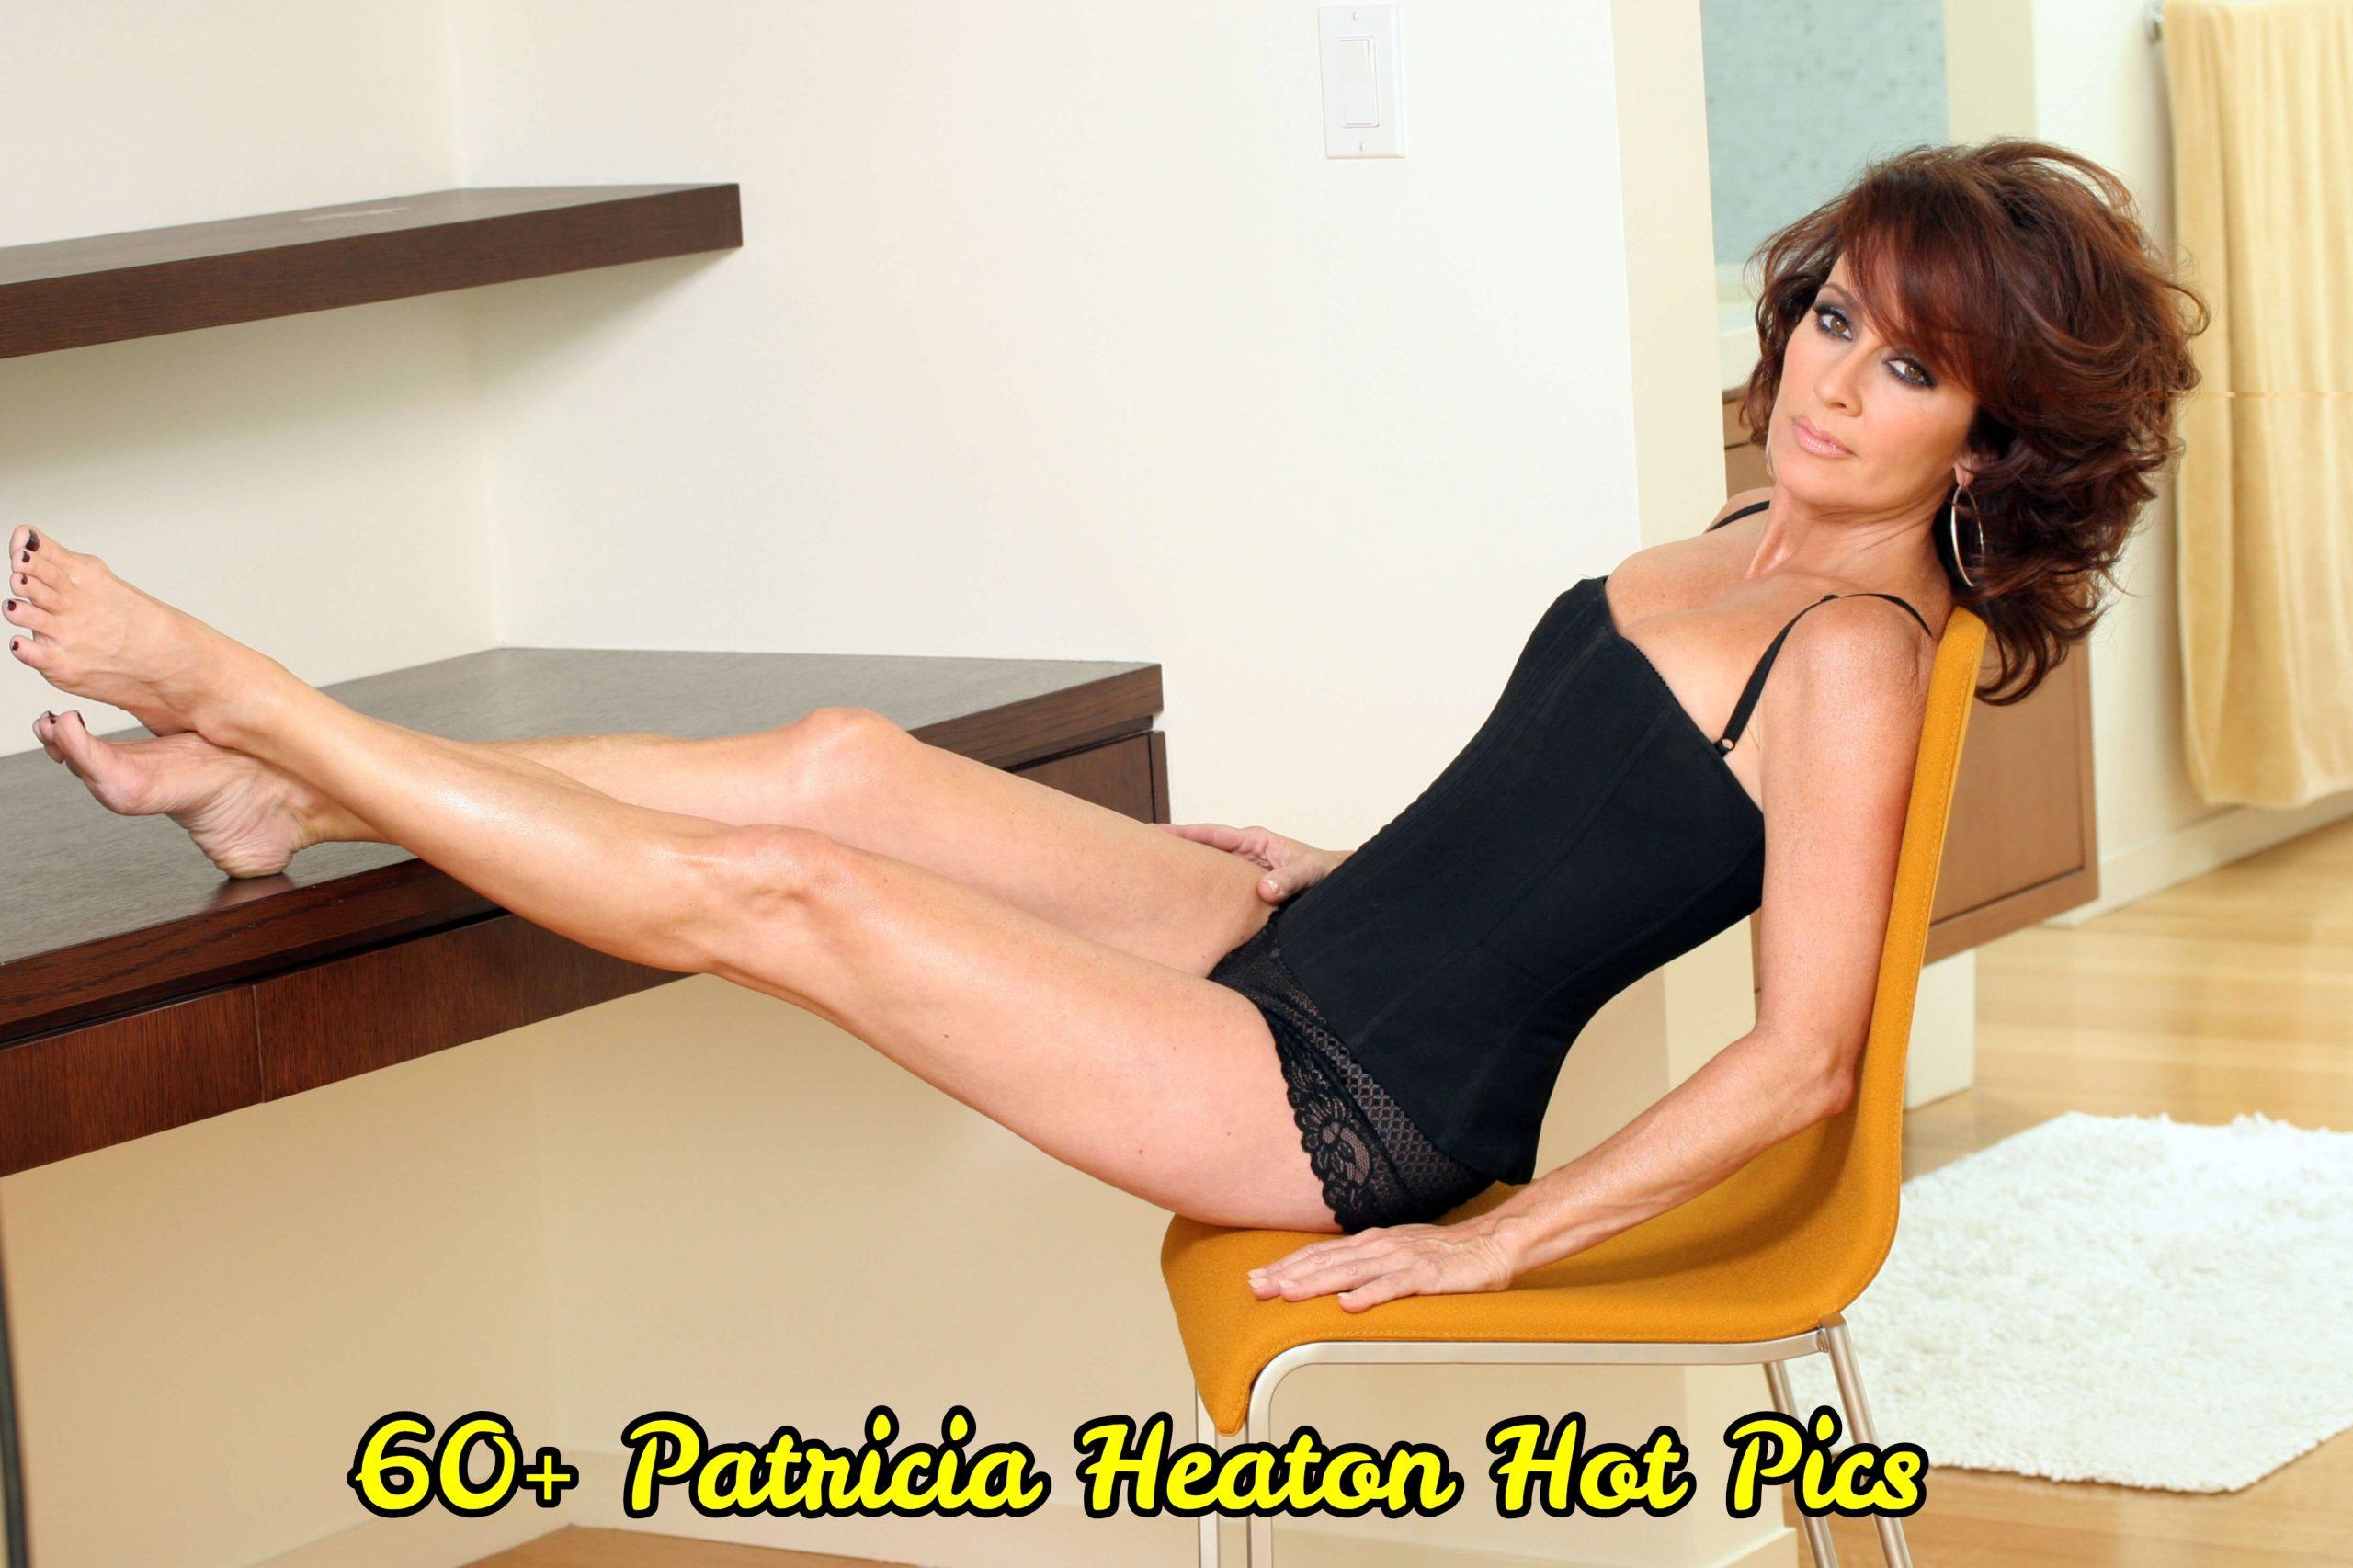 Patricia-Heaton-hot